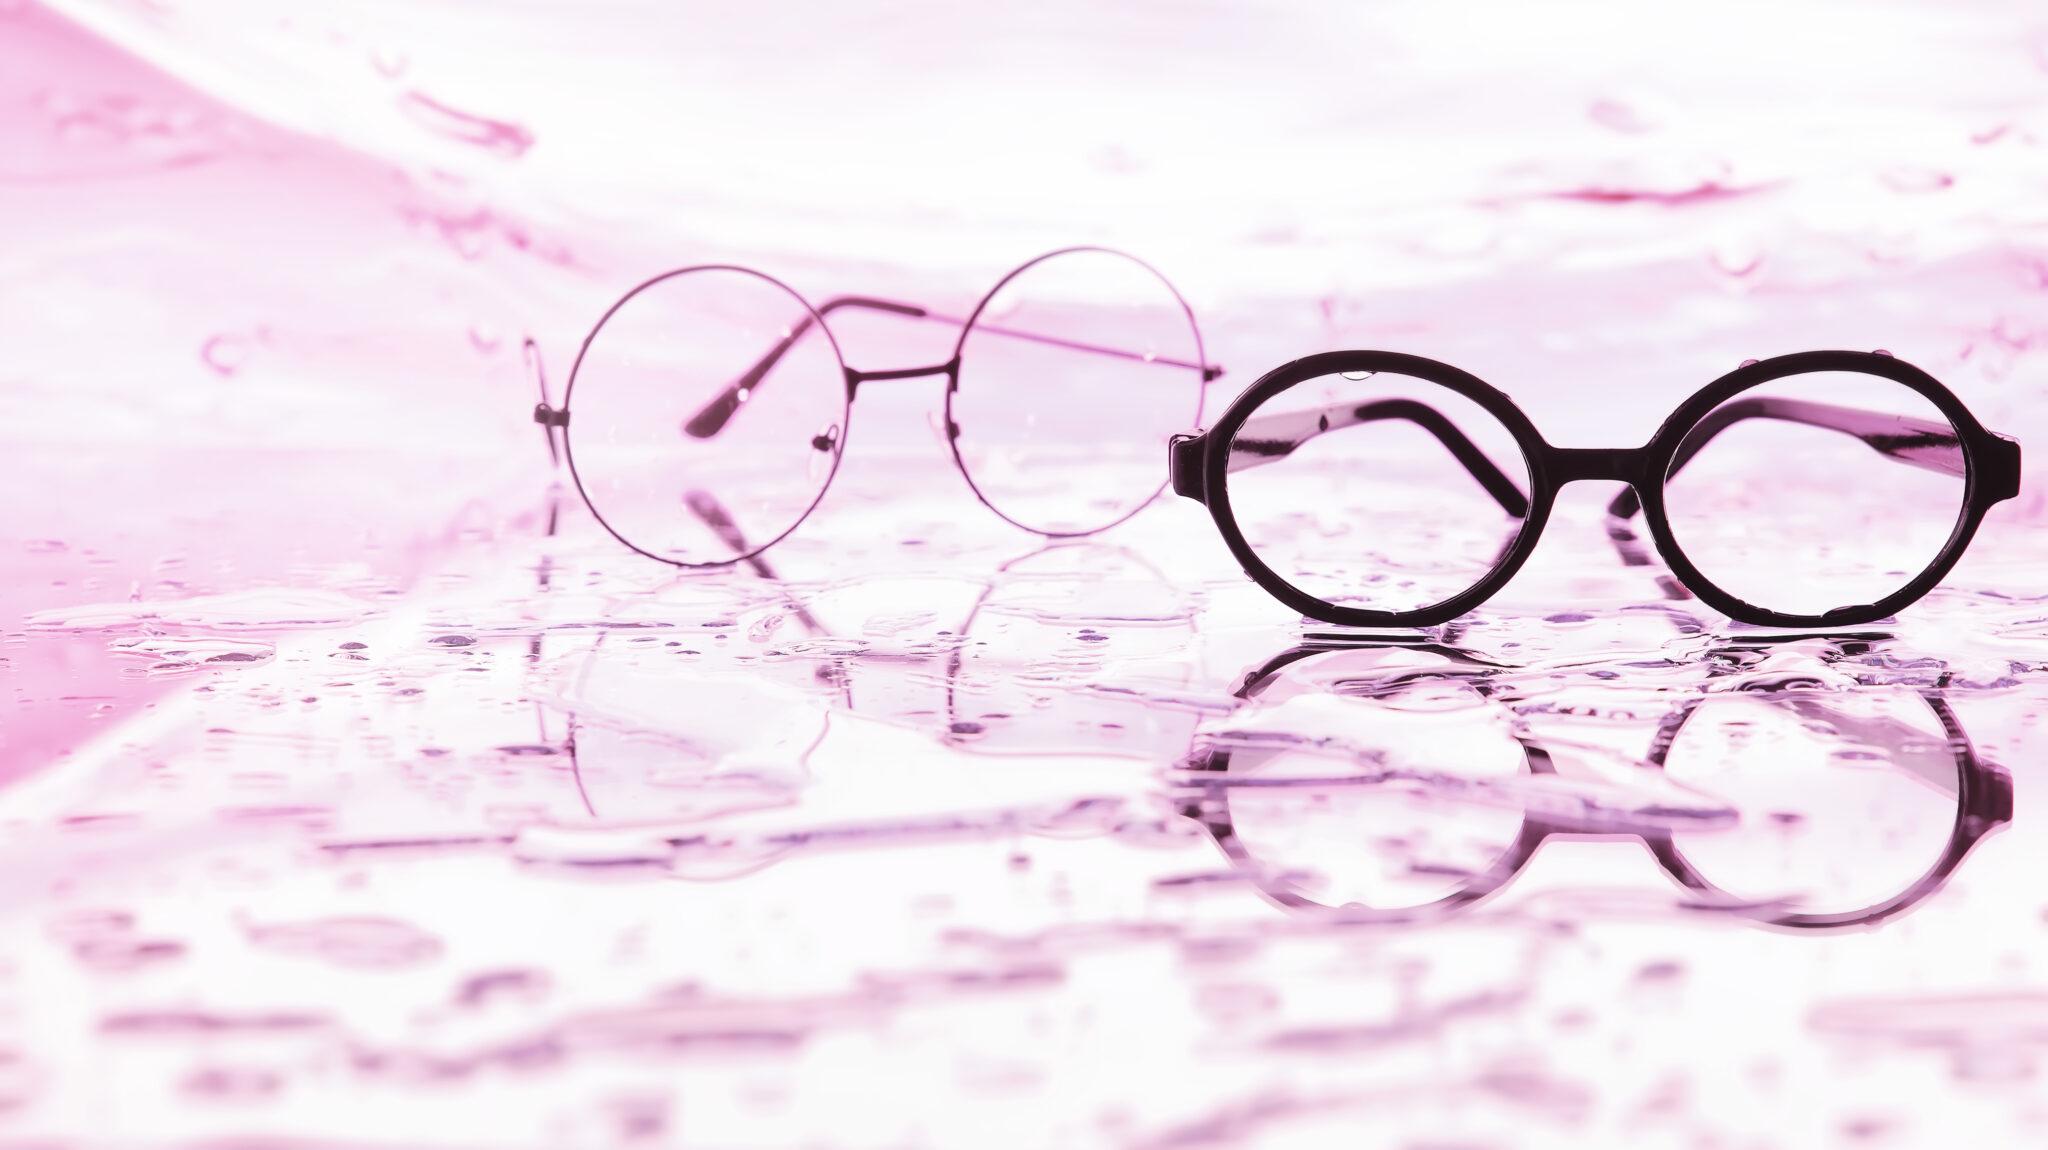 Como desinfectar correctamente tus gafas de virus y bacterias